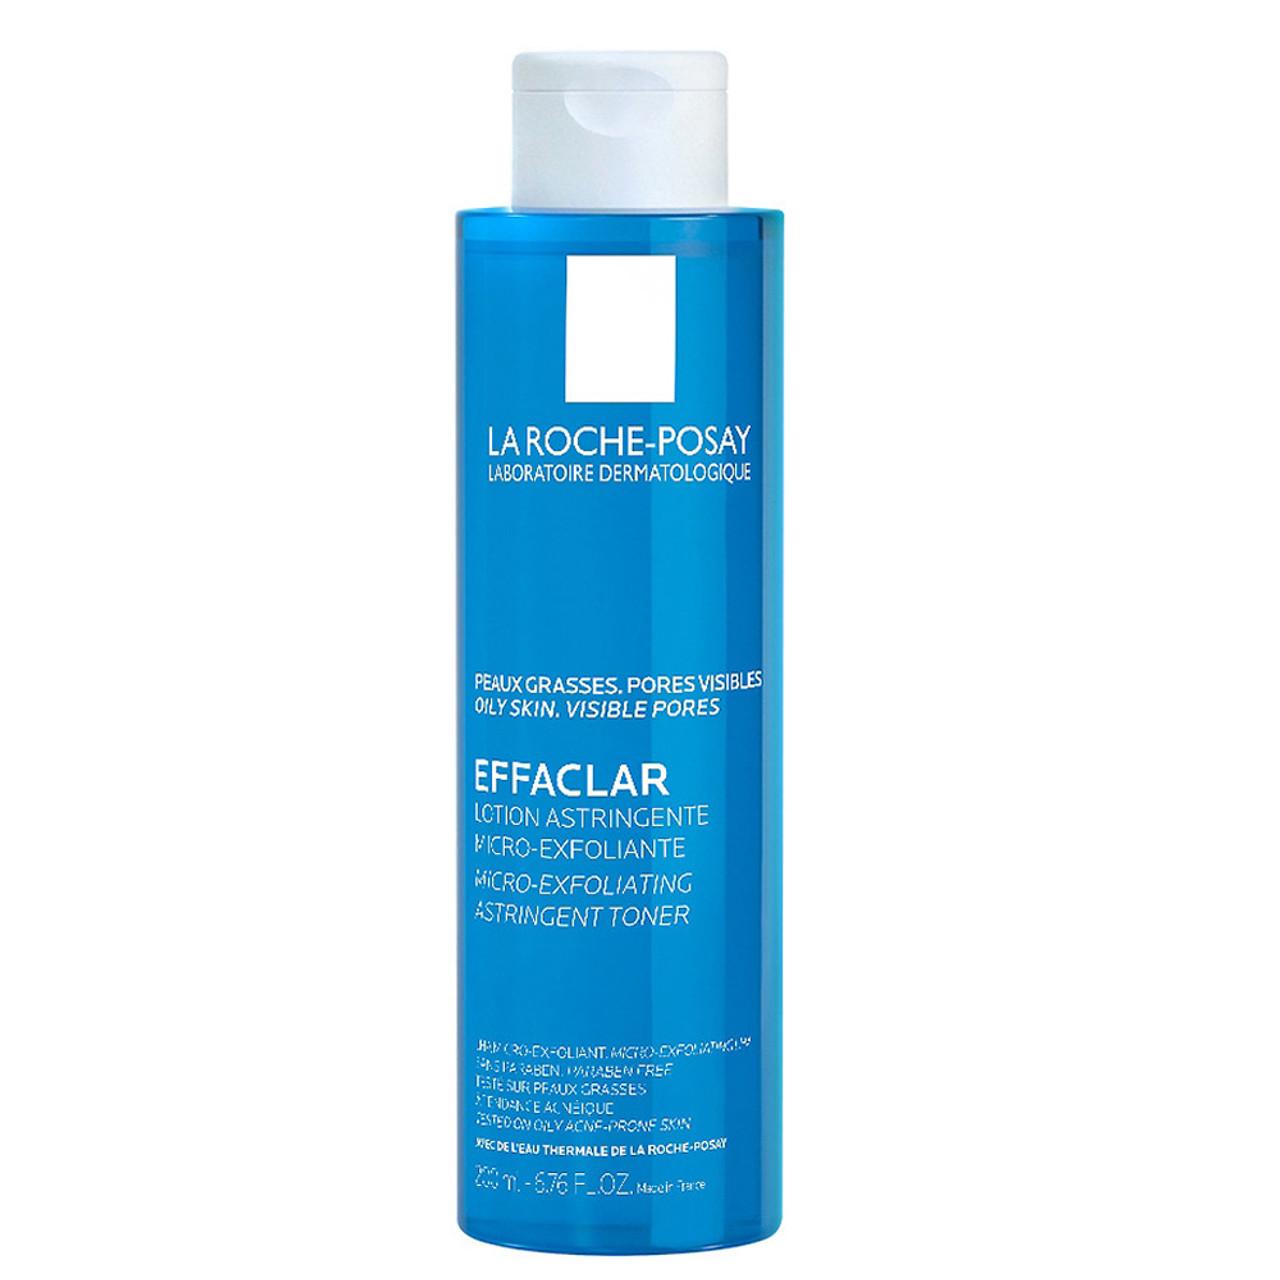 La Roche Posay Effaclar Micro-Exfoliating Astringent Toner